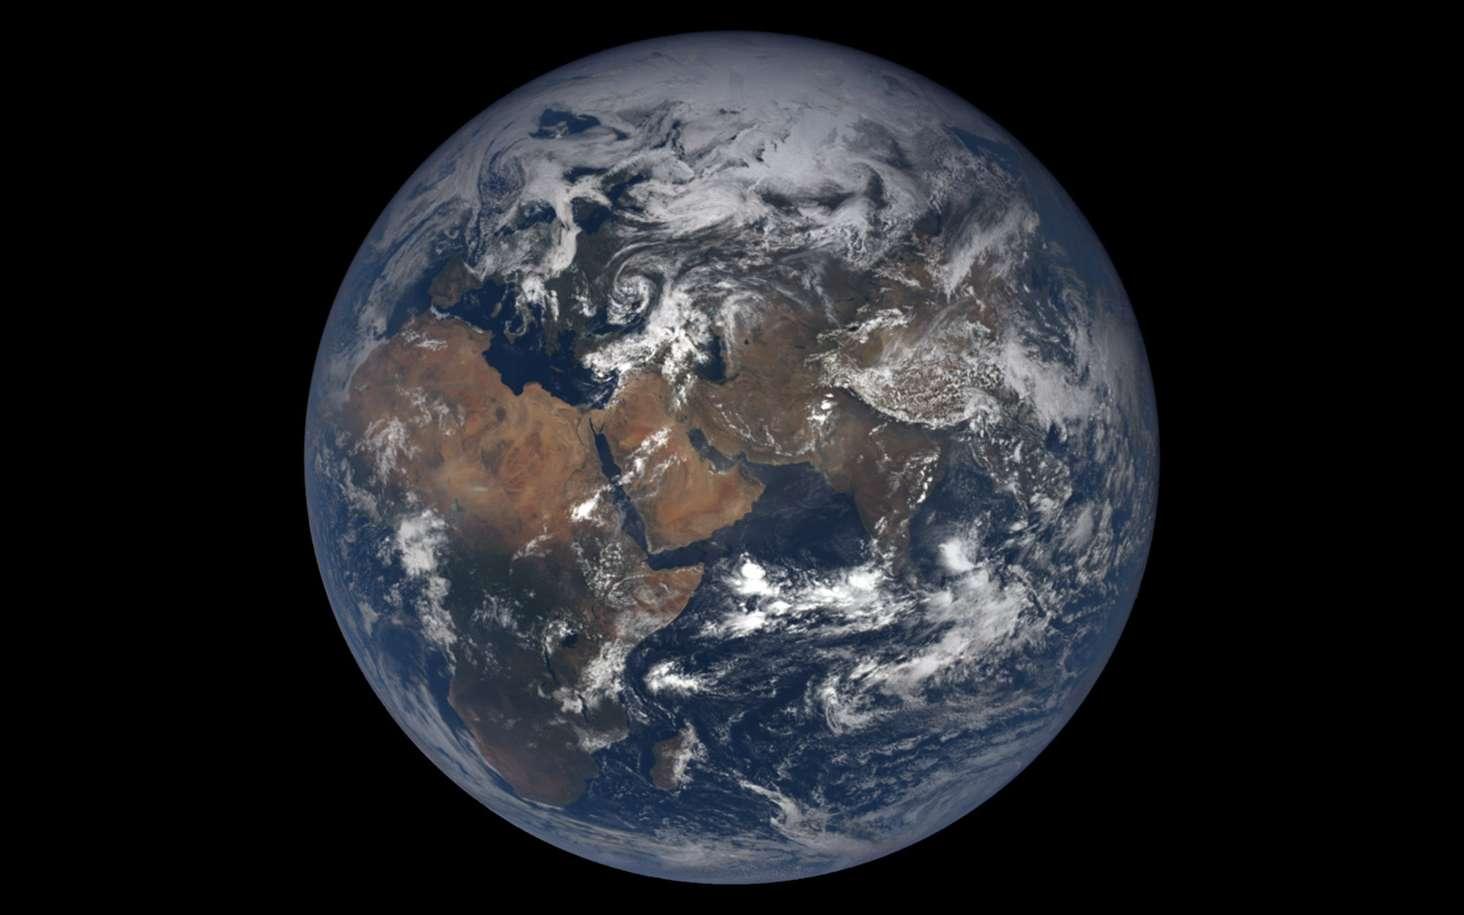 La Terre observée depuis le satellite DSCOVR de la Nasa. © Nasa, DSCOVR EPIC team